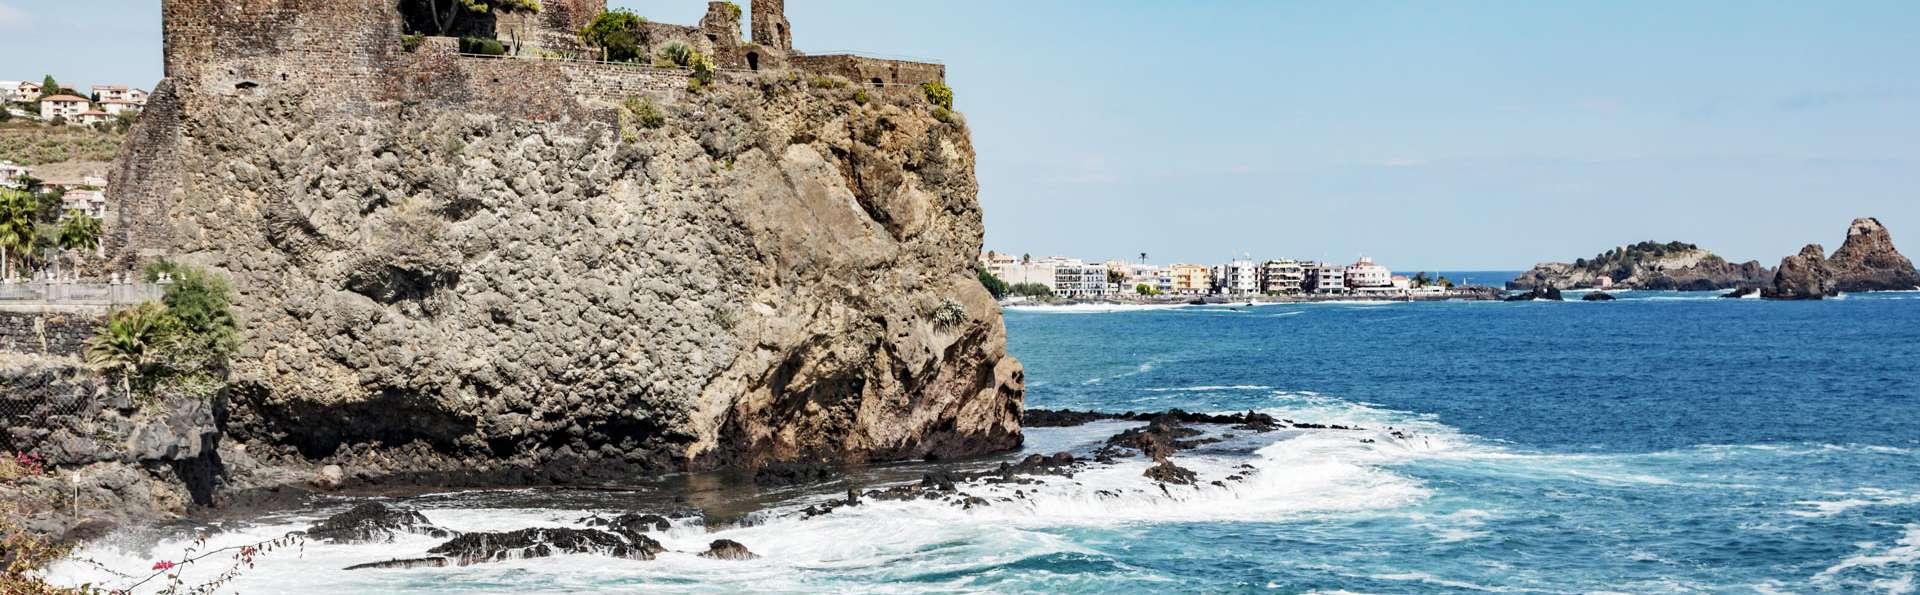 Sicilia's Art Hotel & SPA - EDIT_ACI_CASTELLO_03.jpg